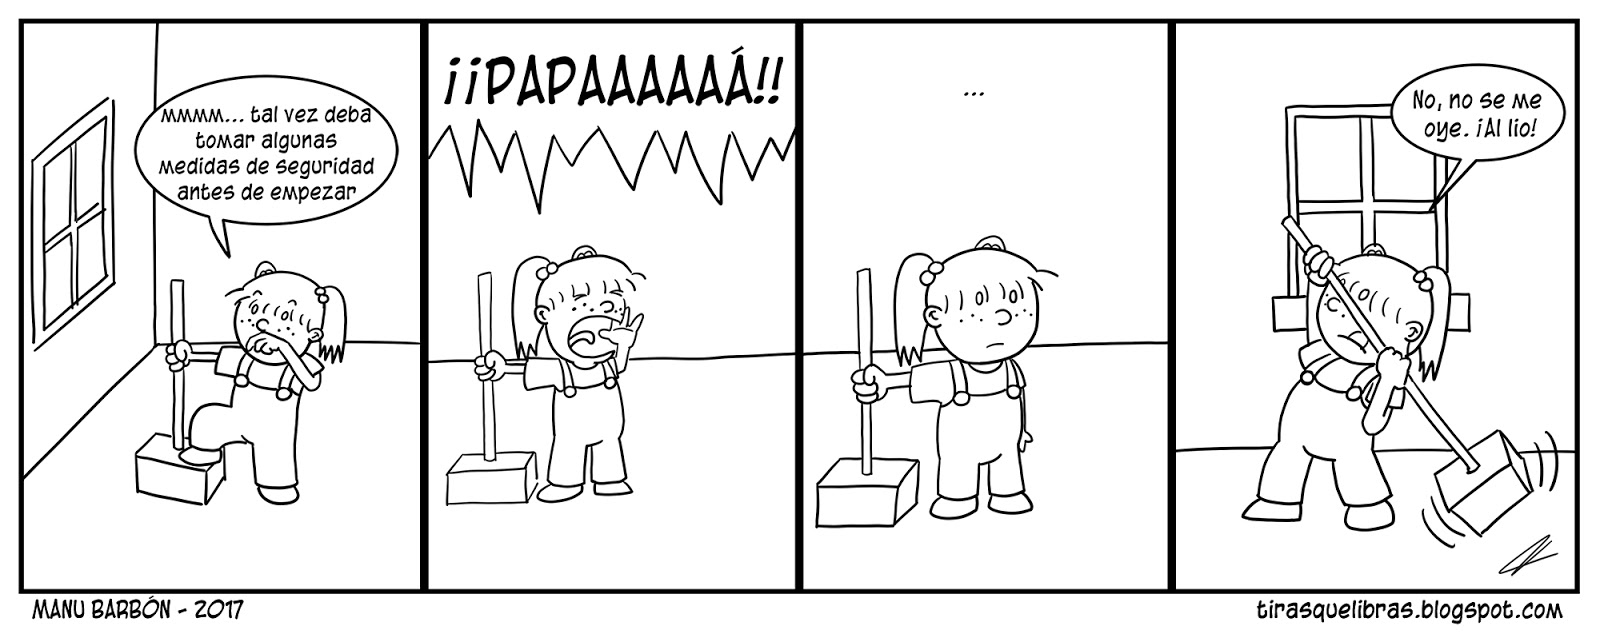 webcomic, jen comprueba la seguridad